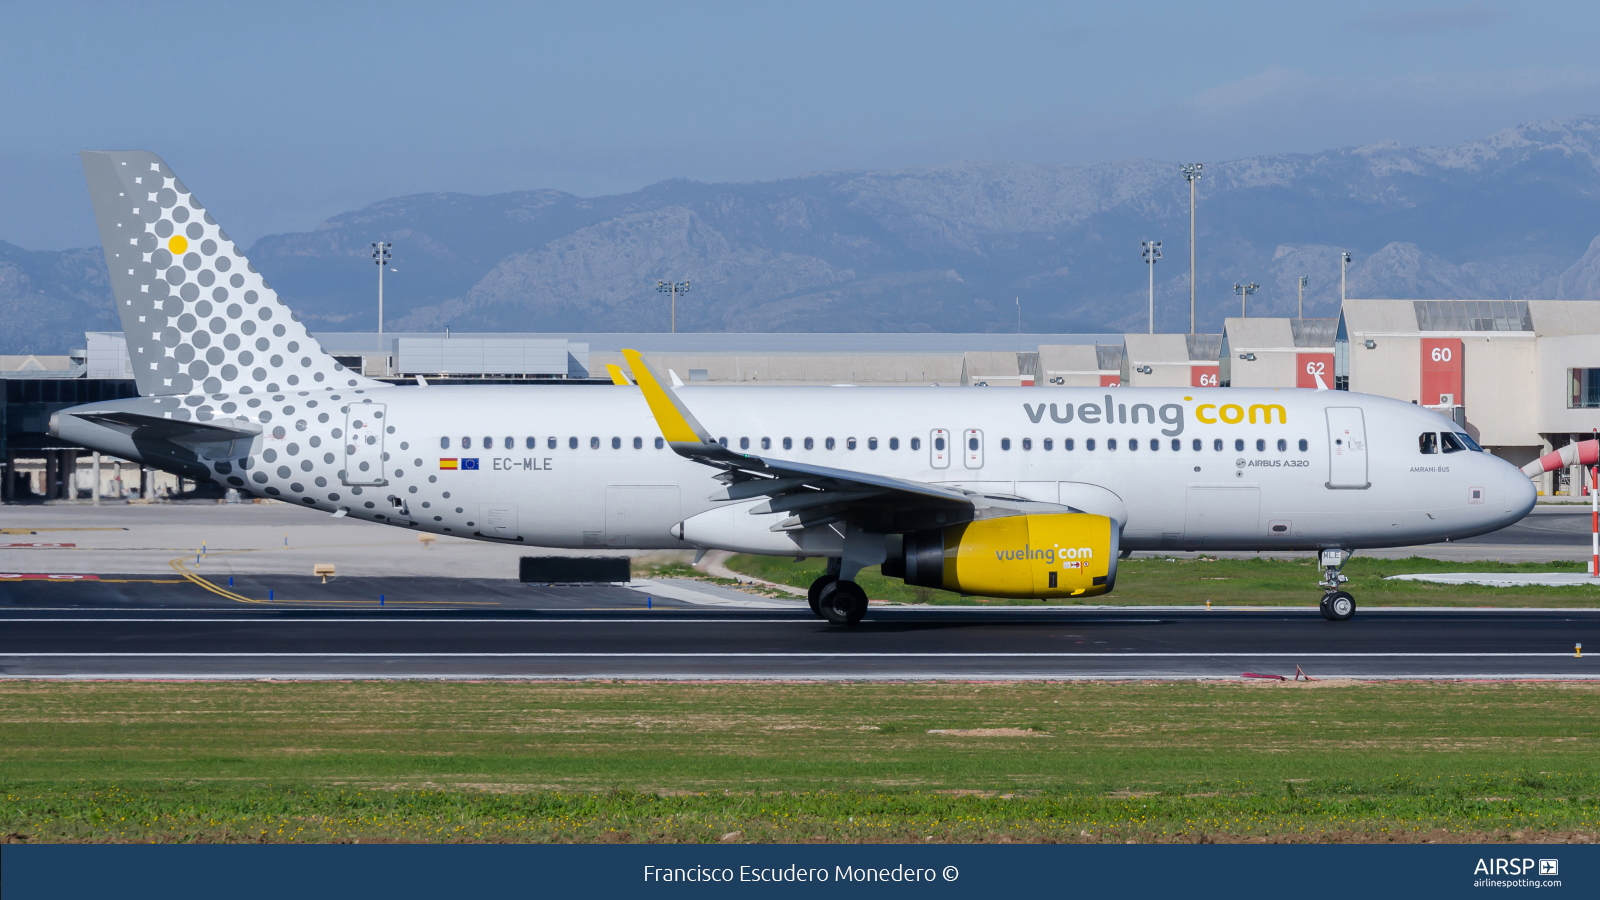 VuelingAirbus A320EC-MLE